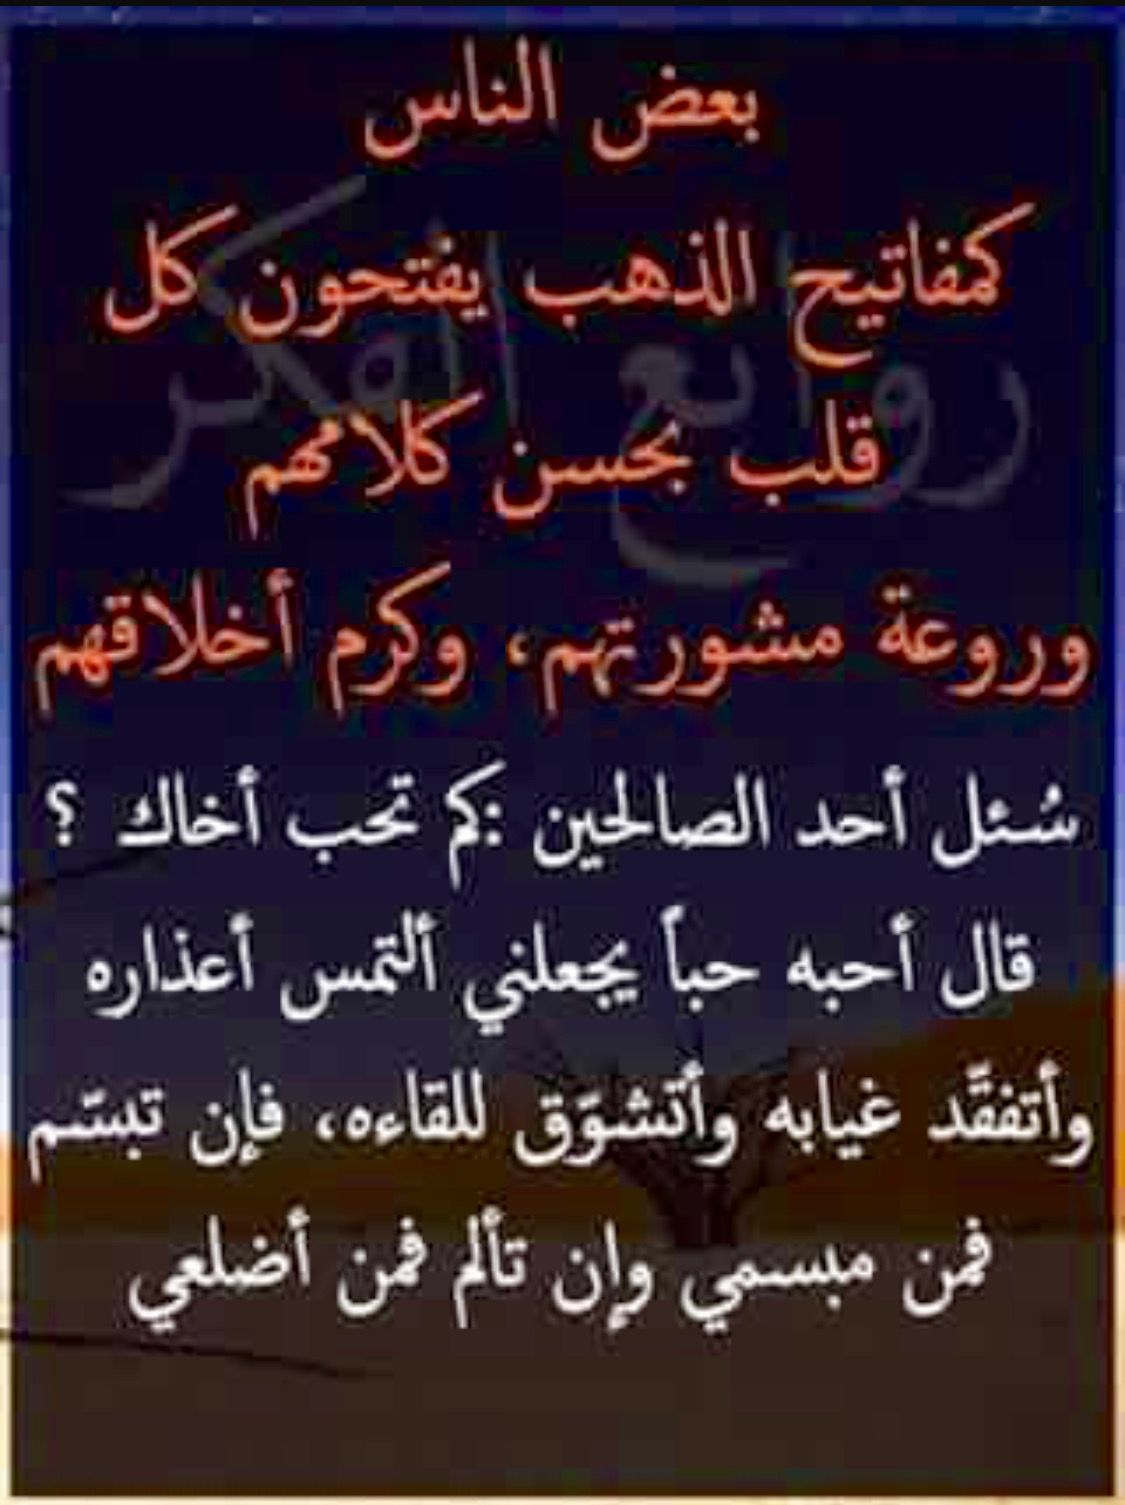 Desertrose حسن الخلق هو مفتاح التعامل مع الناس Inspirational Words I Love My Son Inspirational Quotes